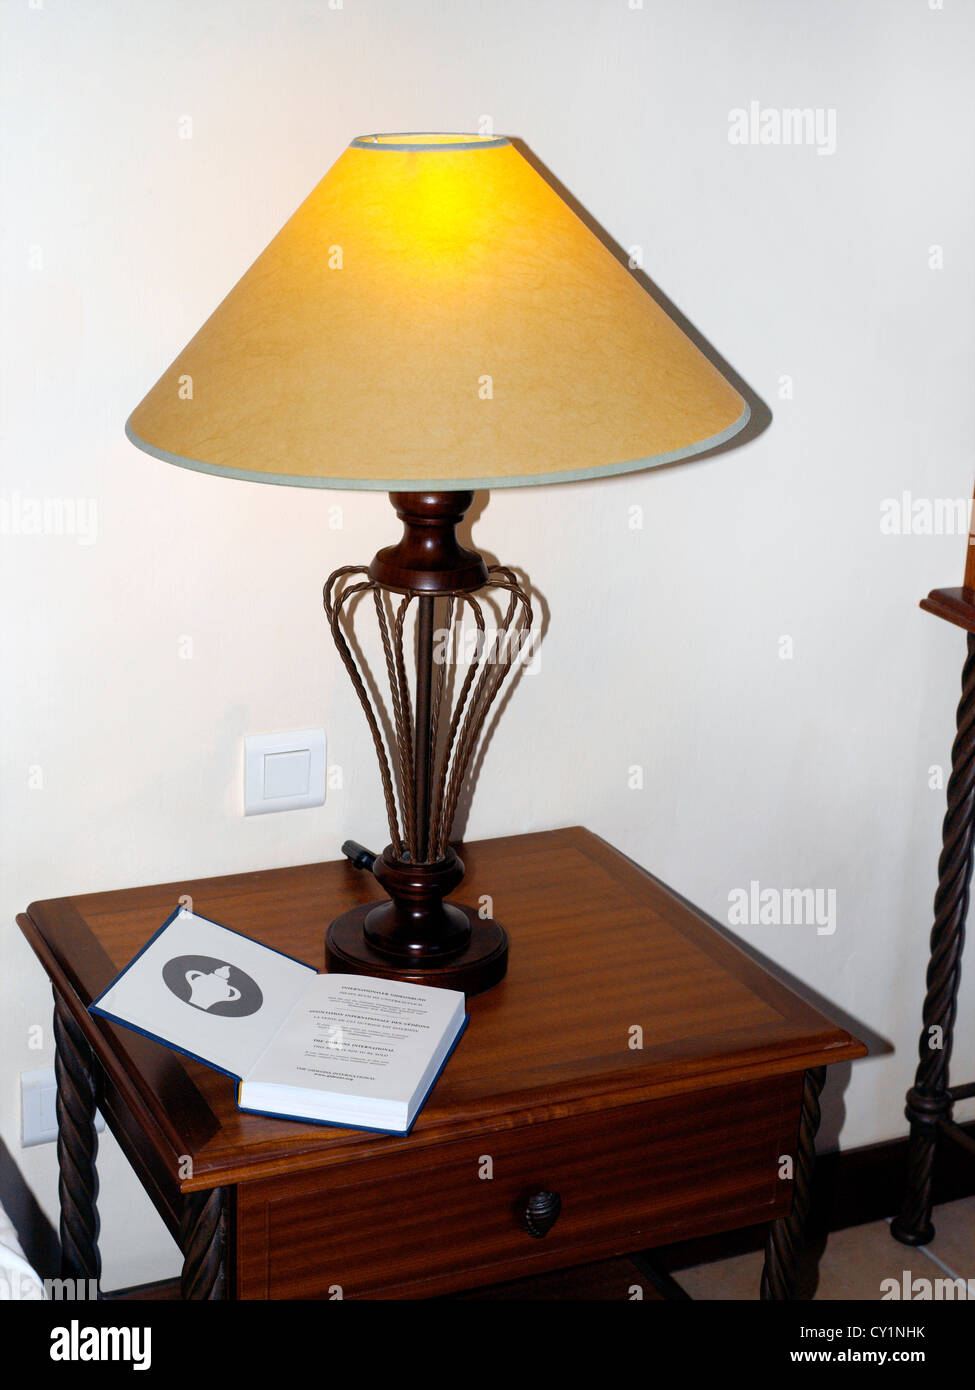 Balaclava Mauritius Hotel Maritim Gideon Bible and Lamp in Bedroom Stock Photo